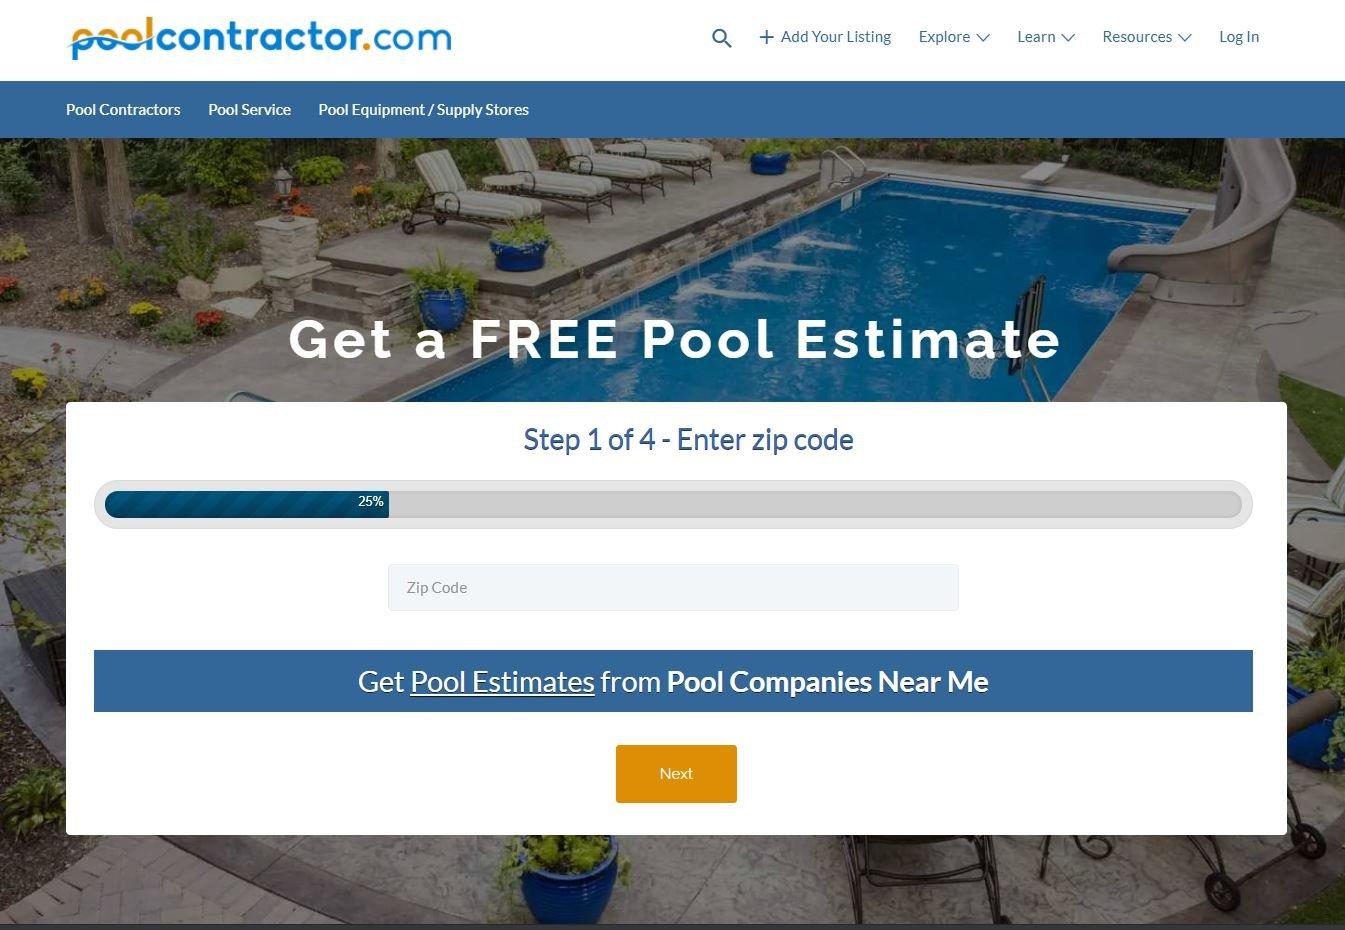 Pool Contractors